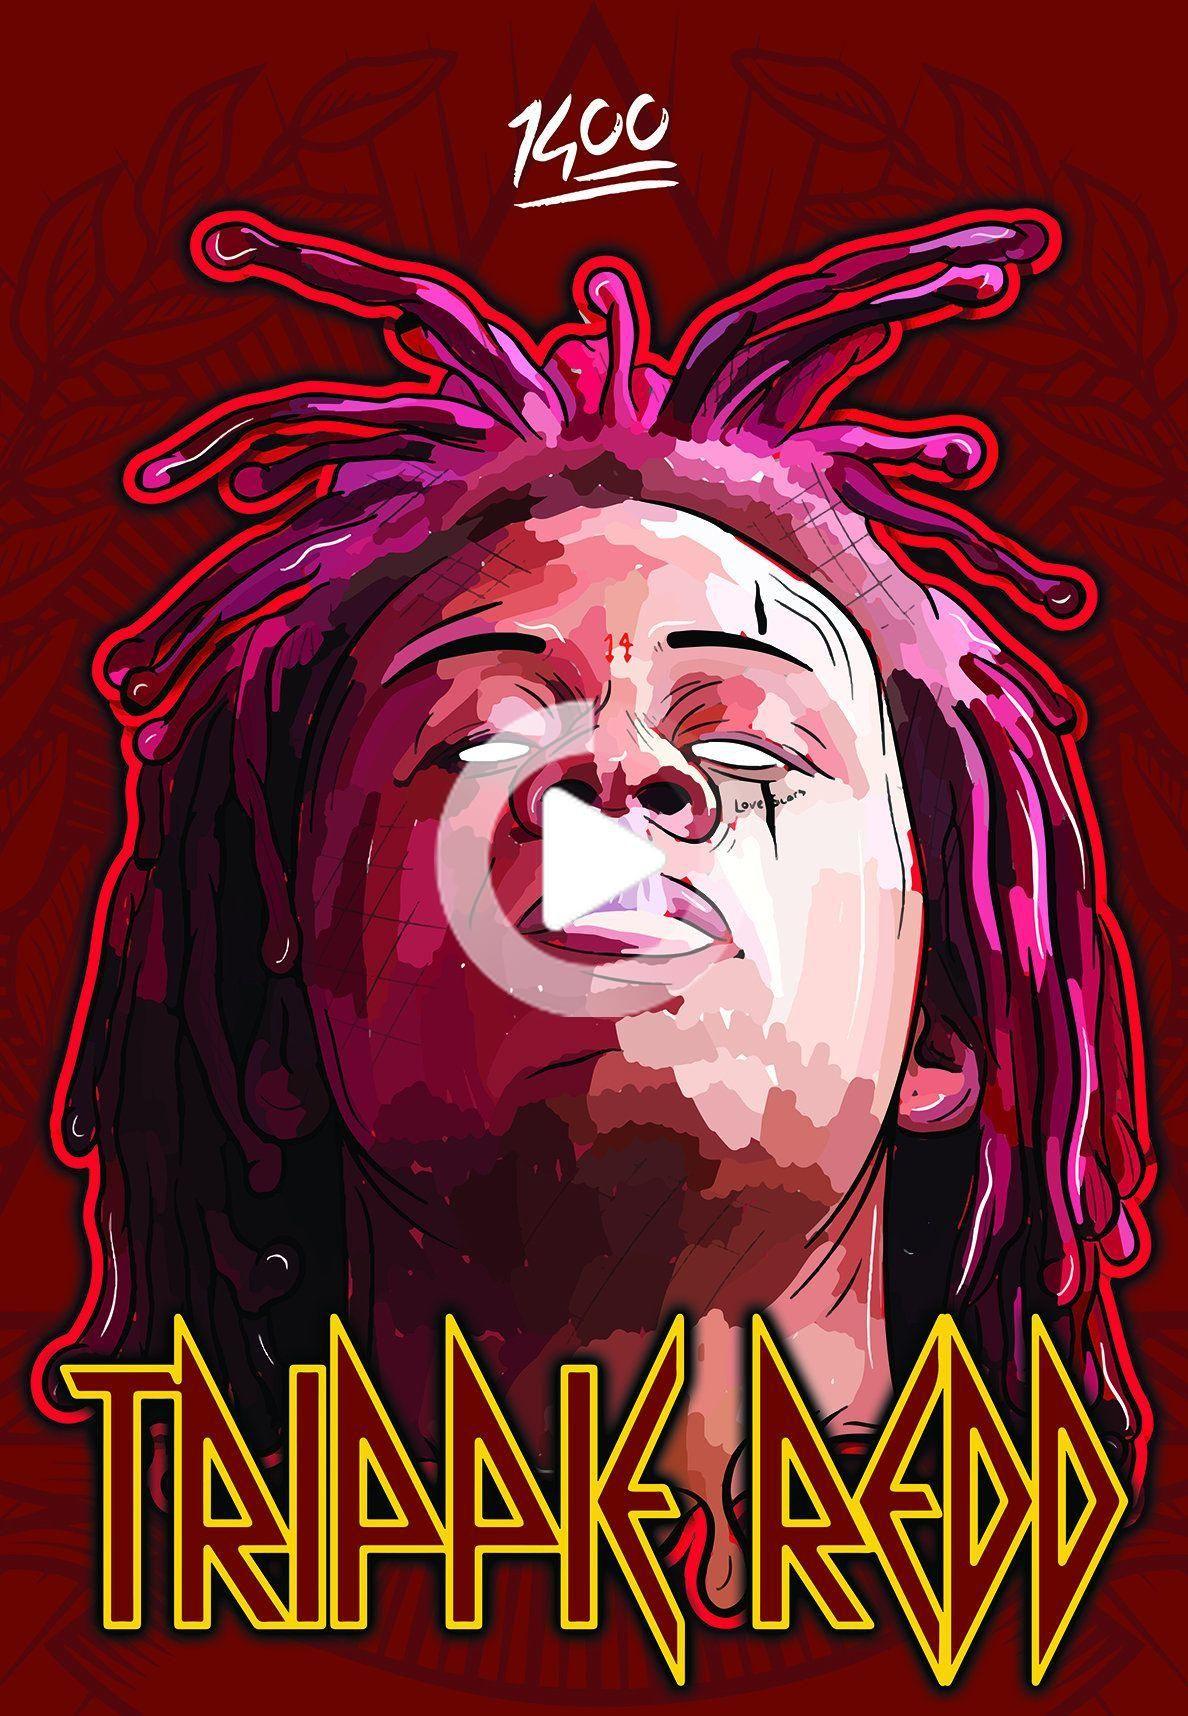 Trip Redd Poster Canvas 1400 Freemelly Trippie Redd Trippy Wallpaper Reds Poster